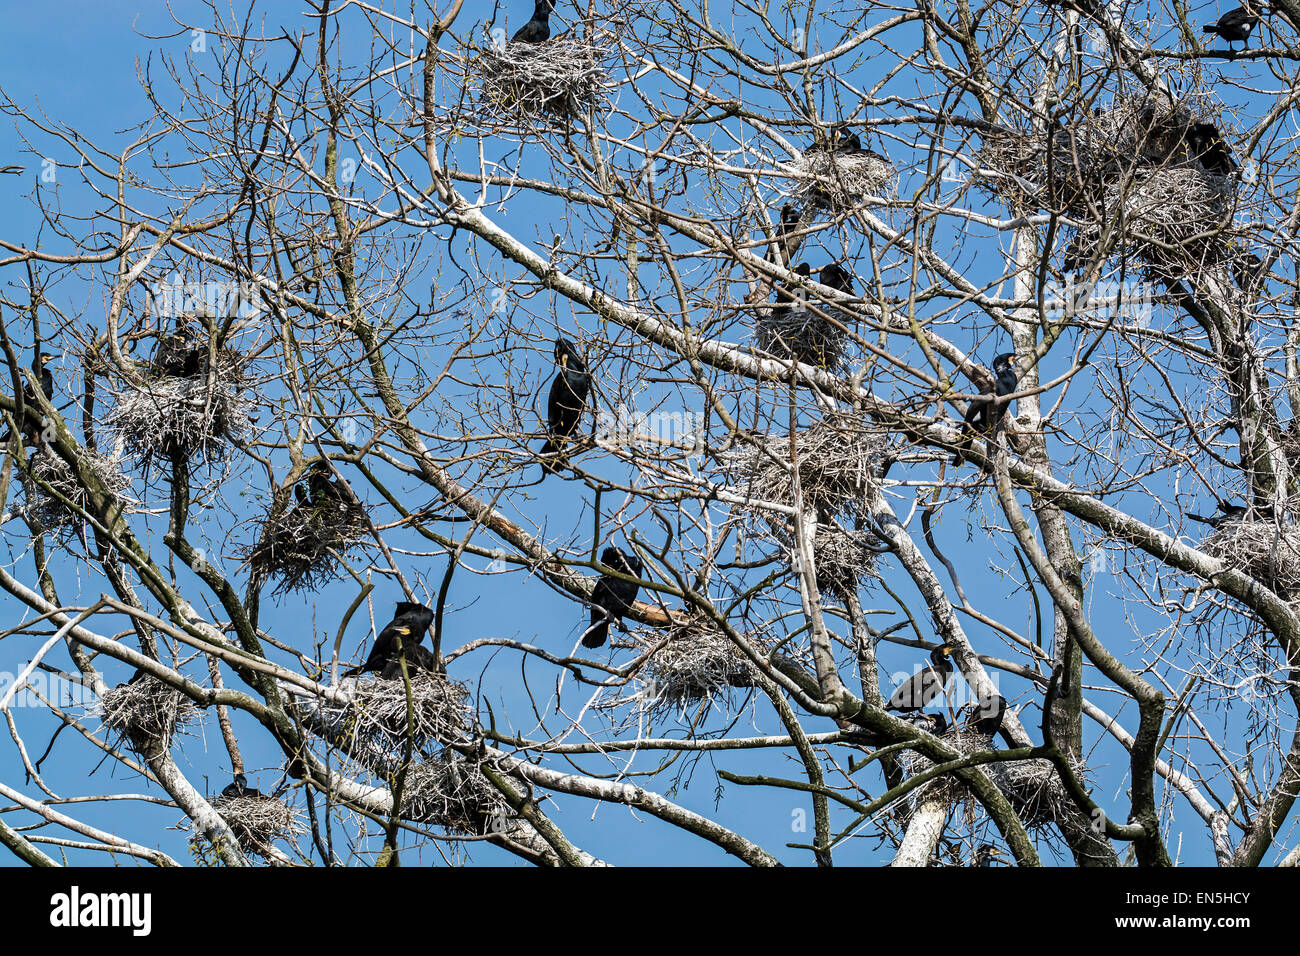 Colony of great cormorants (Phalacrocorax carbo) nesting in dead tree in spring - Stock Image